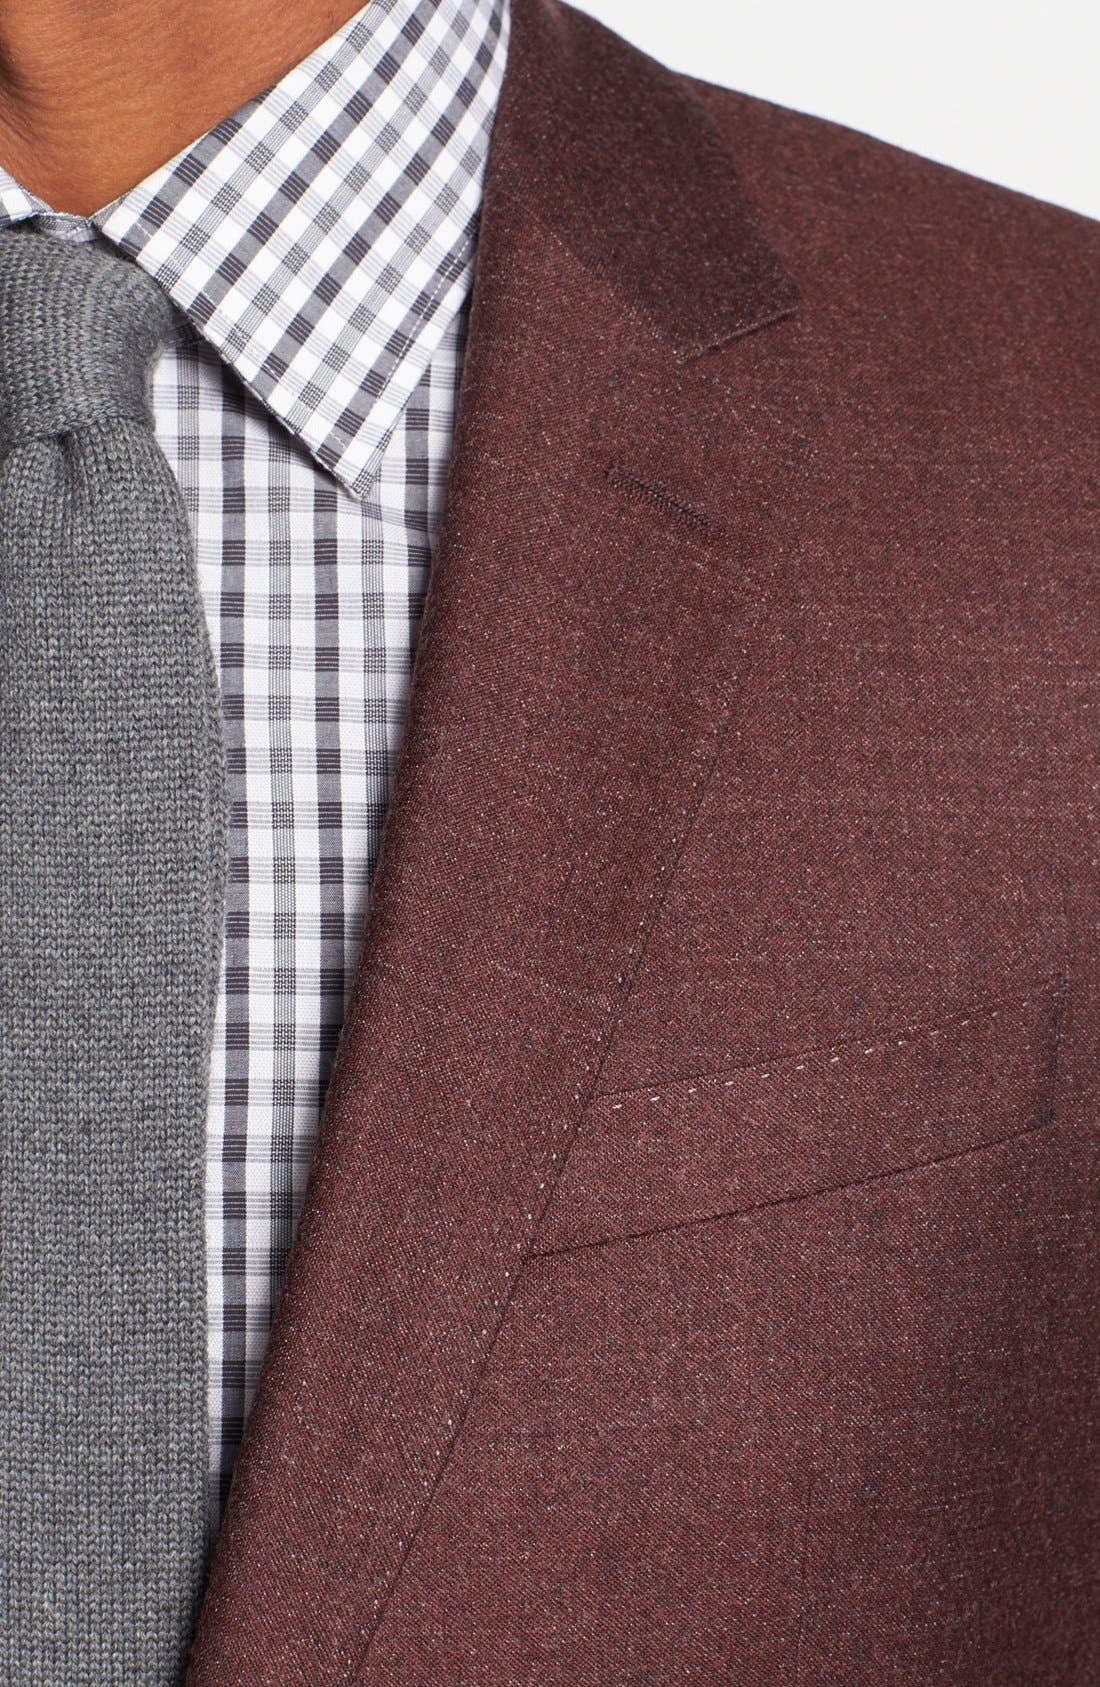 Alternate Image 2  - BOSS HUGO BOSS 'Hutch' Trim Fit Wool Blazer